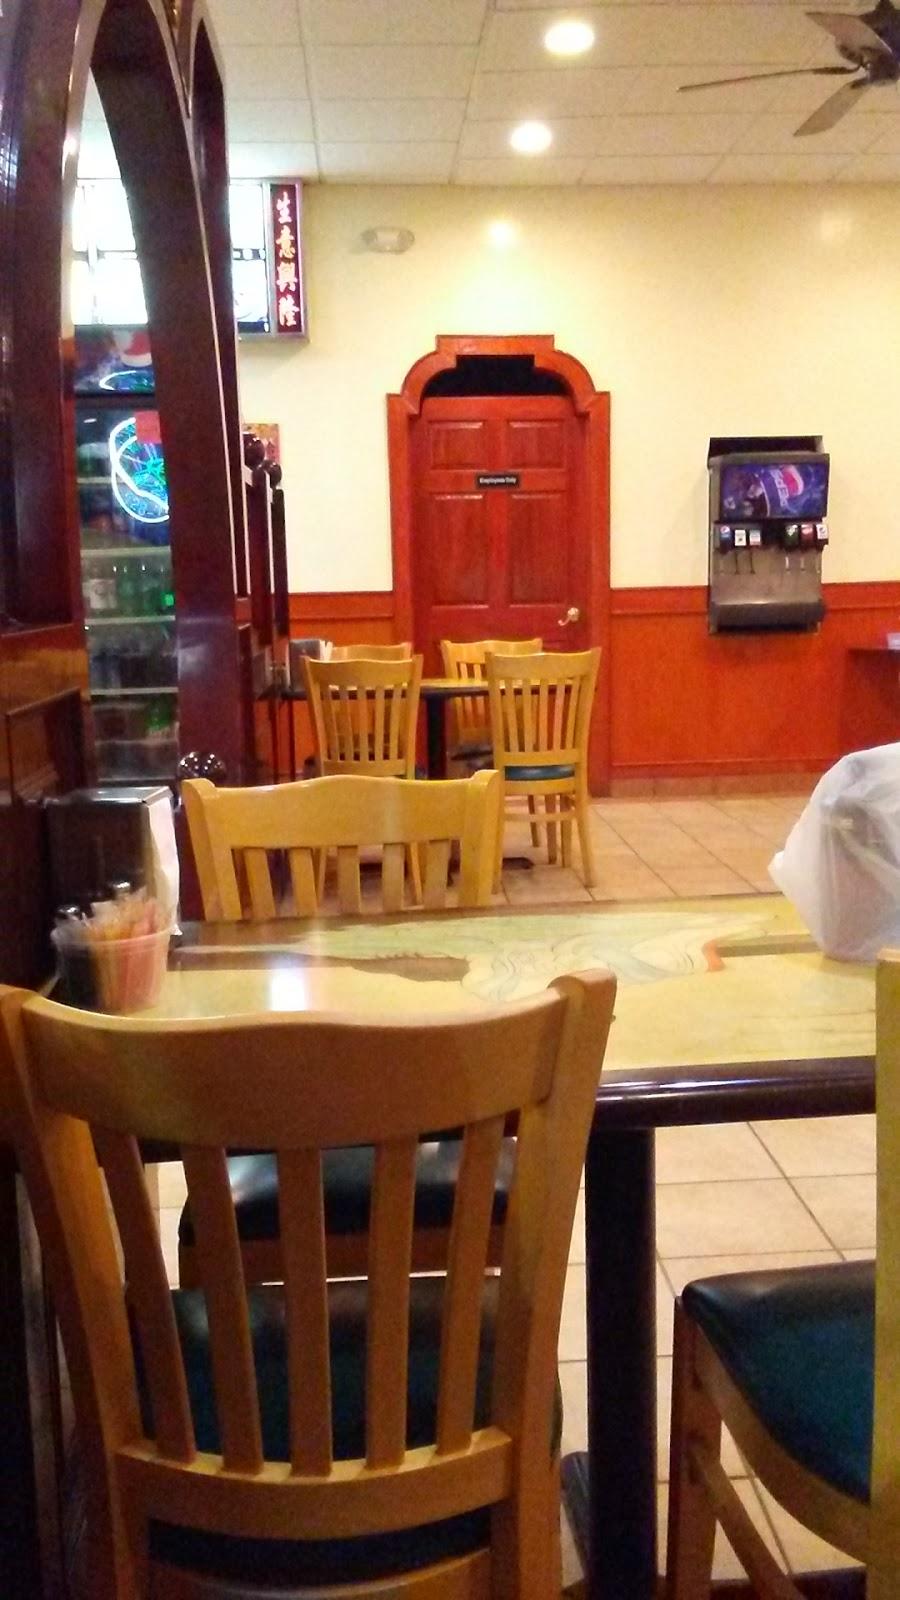 Jade Garden Chinese Restaurant - restaurant  | Photo 10 of 10 | Address: 1577 General Booth Blvd #106, Virginia Beach, VA 23454, USA | Phone: (757) 428-7114